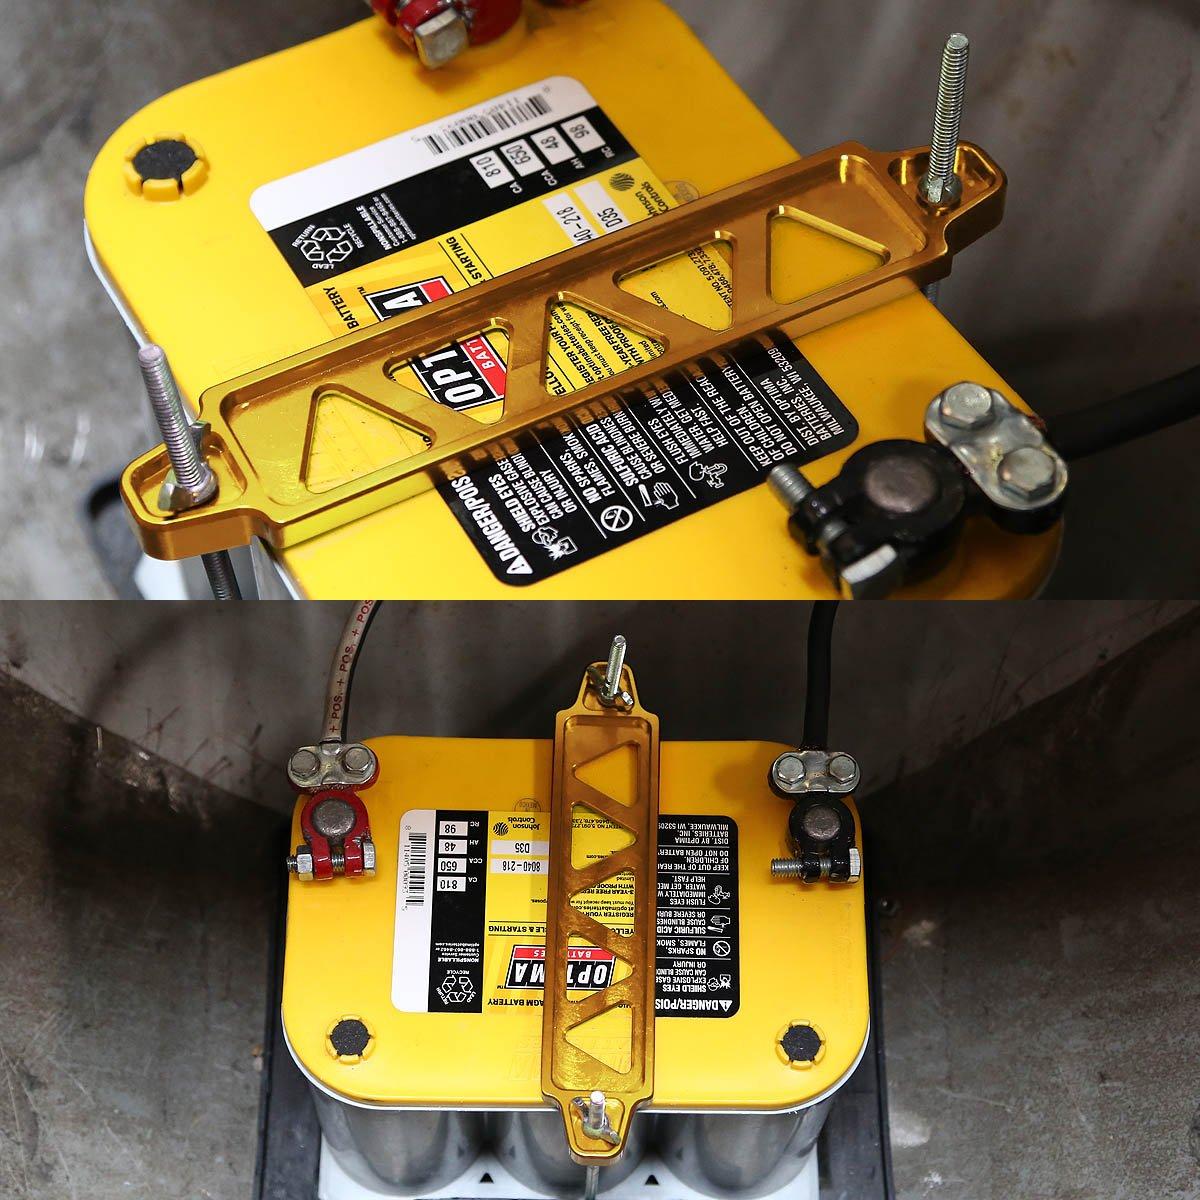 DNA MOTORING Batt-Long-GD Battery Tie Down Mount Bracket